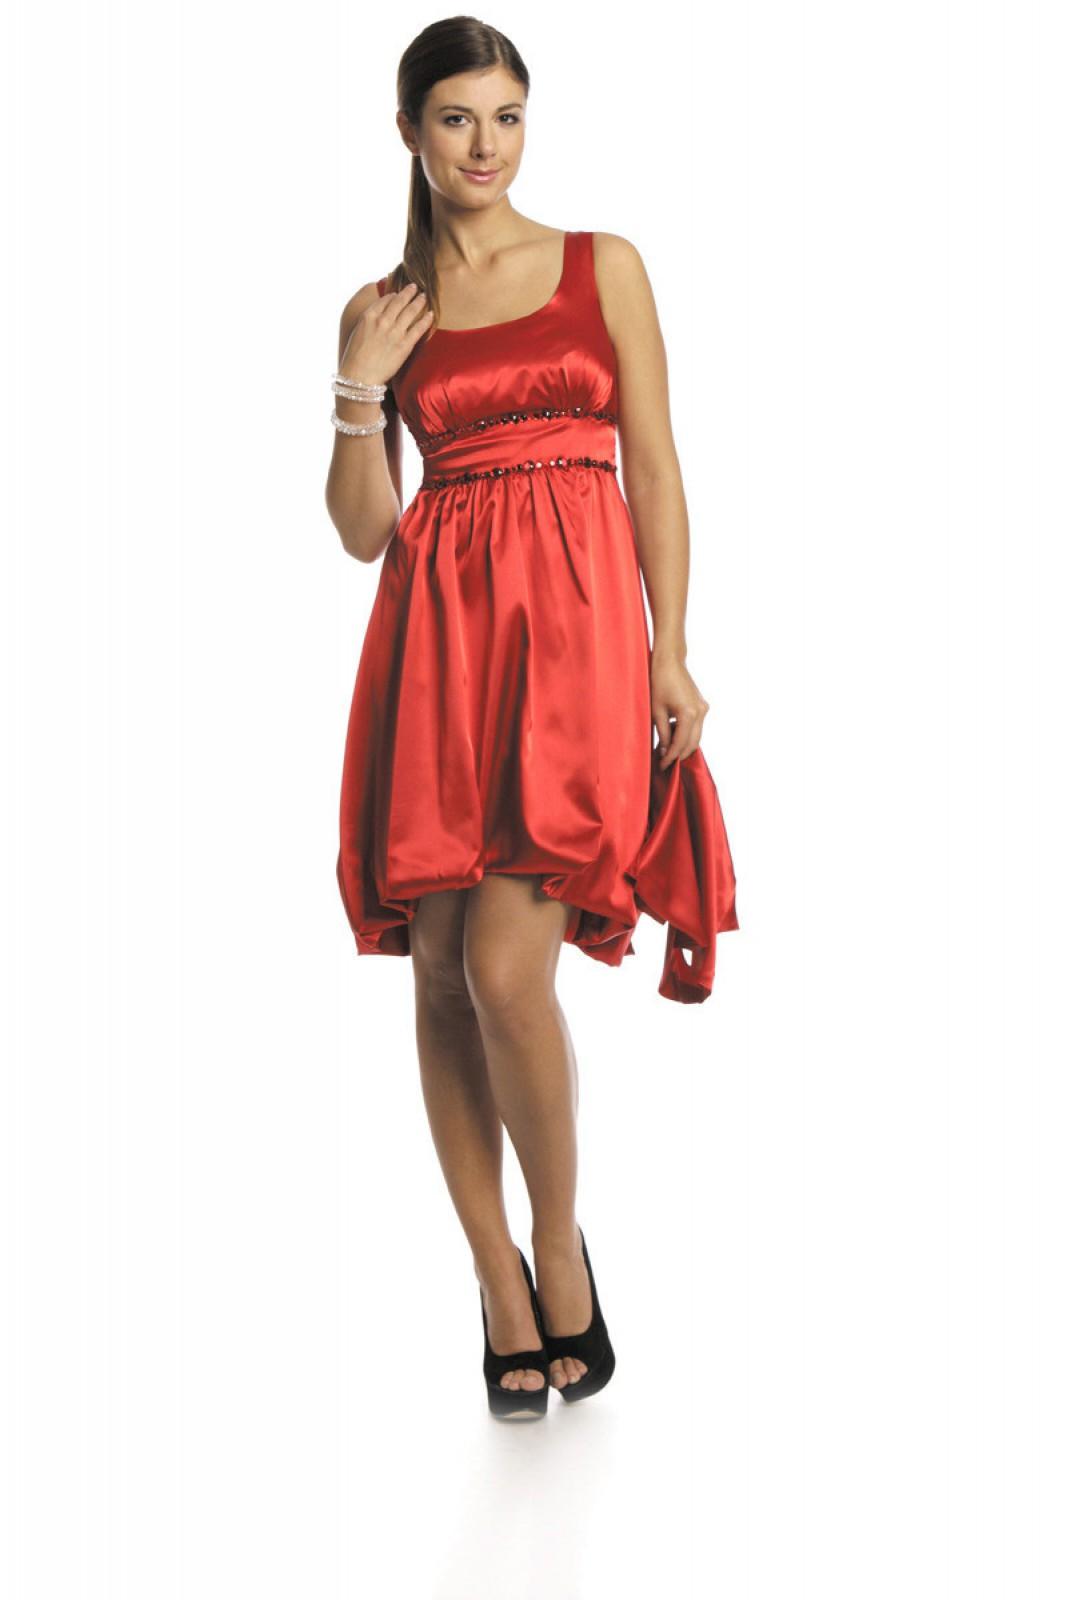 Rotes Cocktailkleid in Ballonform mit Bolero bei ...